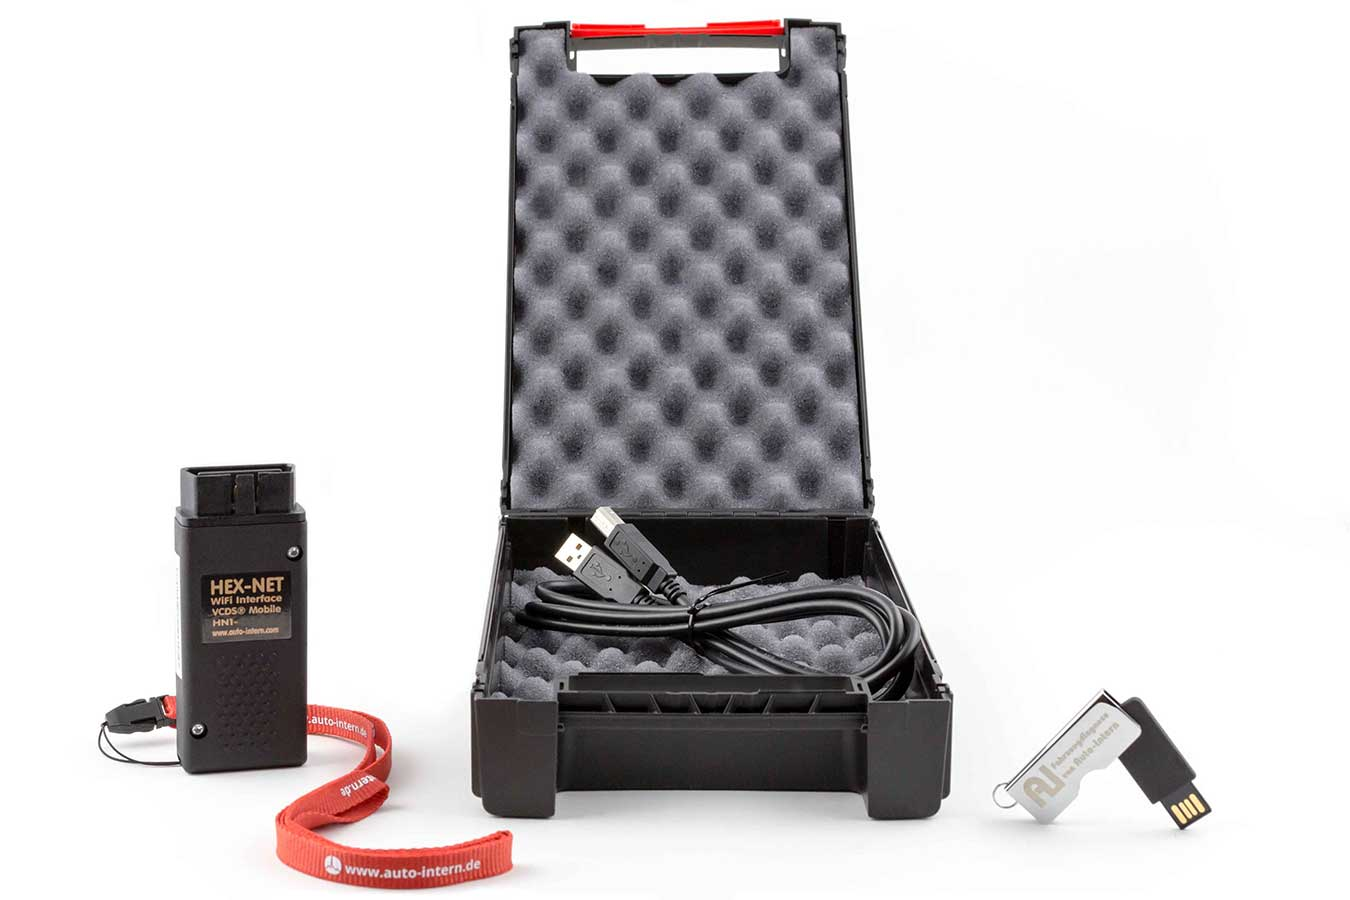 slspeed fahrzeugteile ross tech vcds hex net wifi. Black Bedroom Furniture Sets. Home Design Ideas